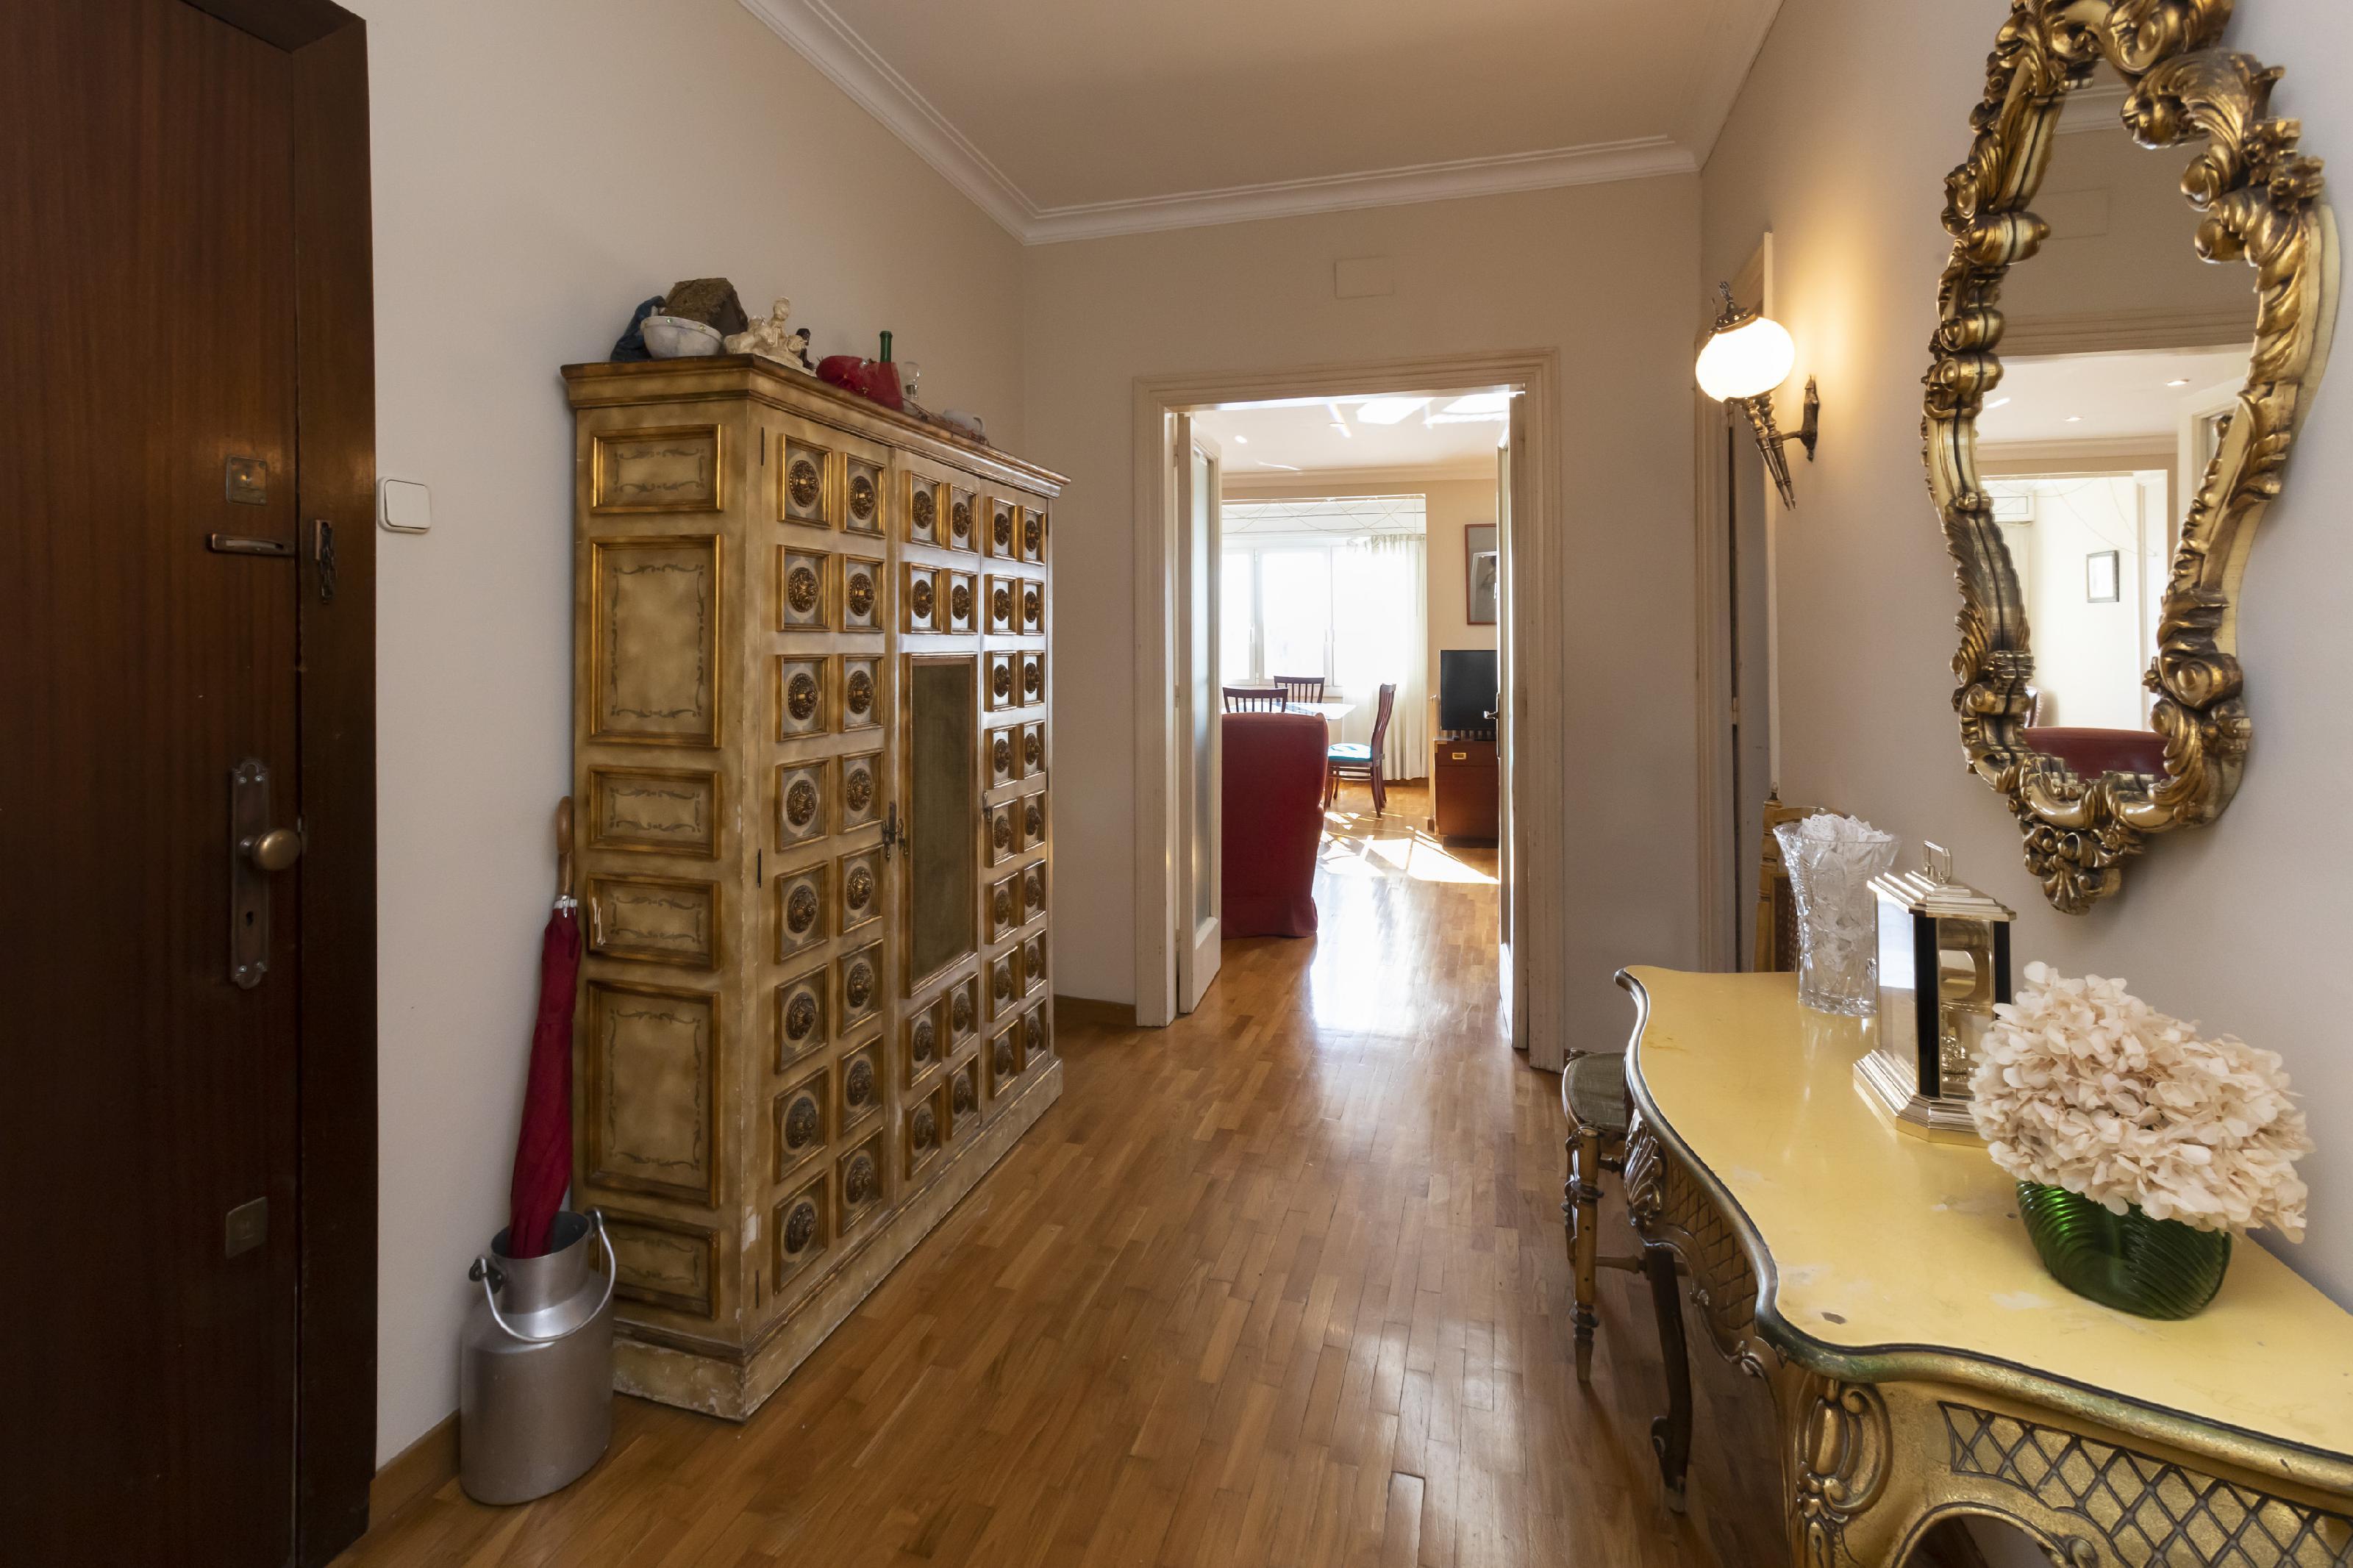 247097 Flat for sale in Sarrià-Sant Gervasi, Sant Gervasi-Galvany 11